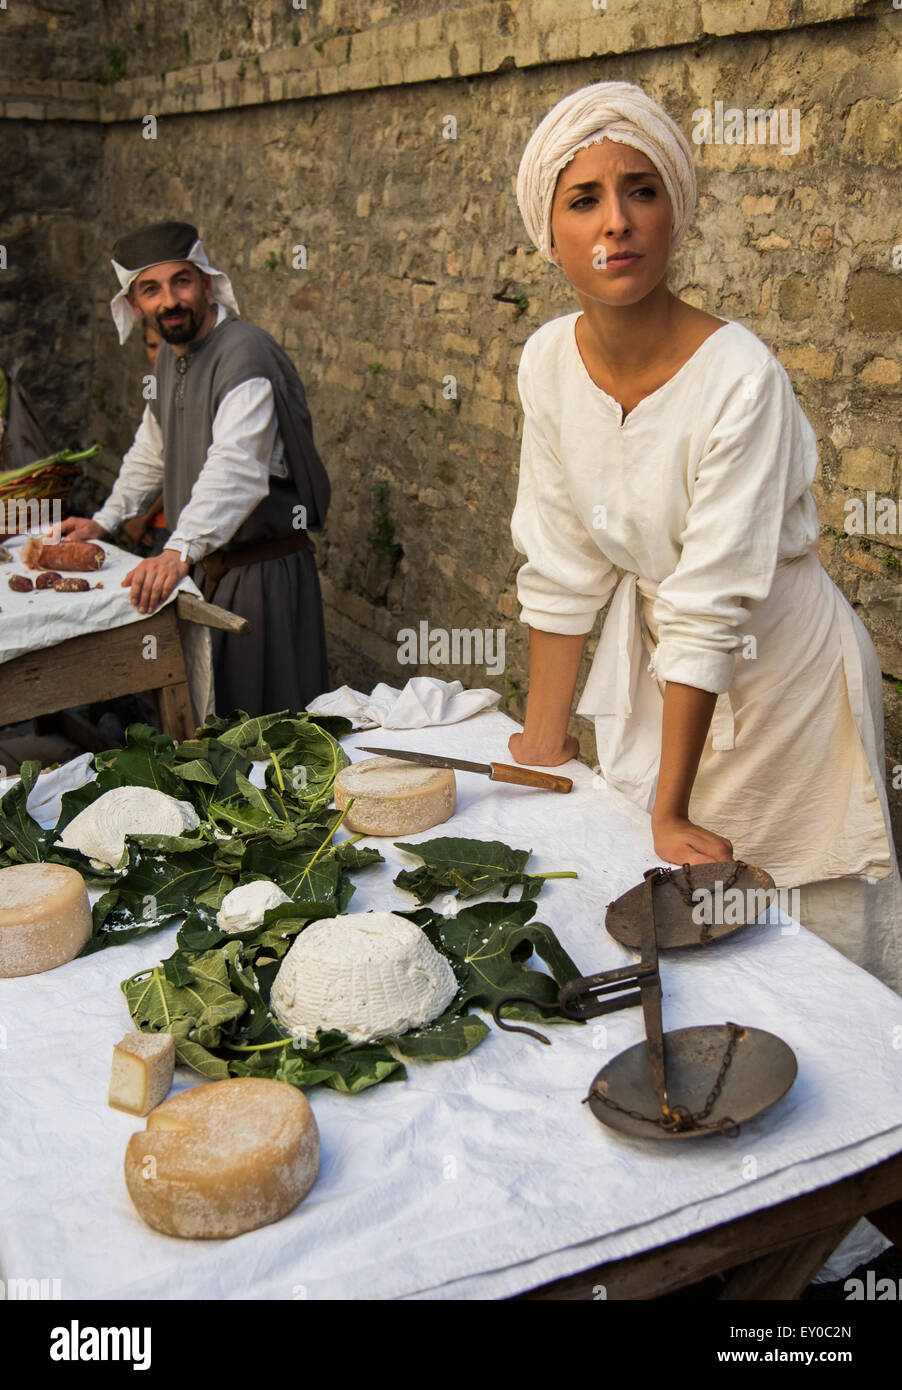 Annual medieval festival of the Mercato delle Gaite, Bevagna, Umbria - Stock Image